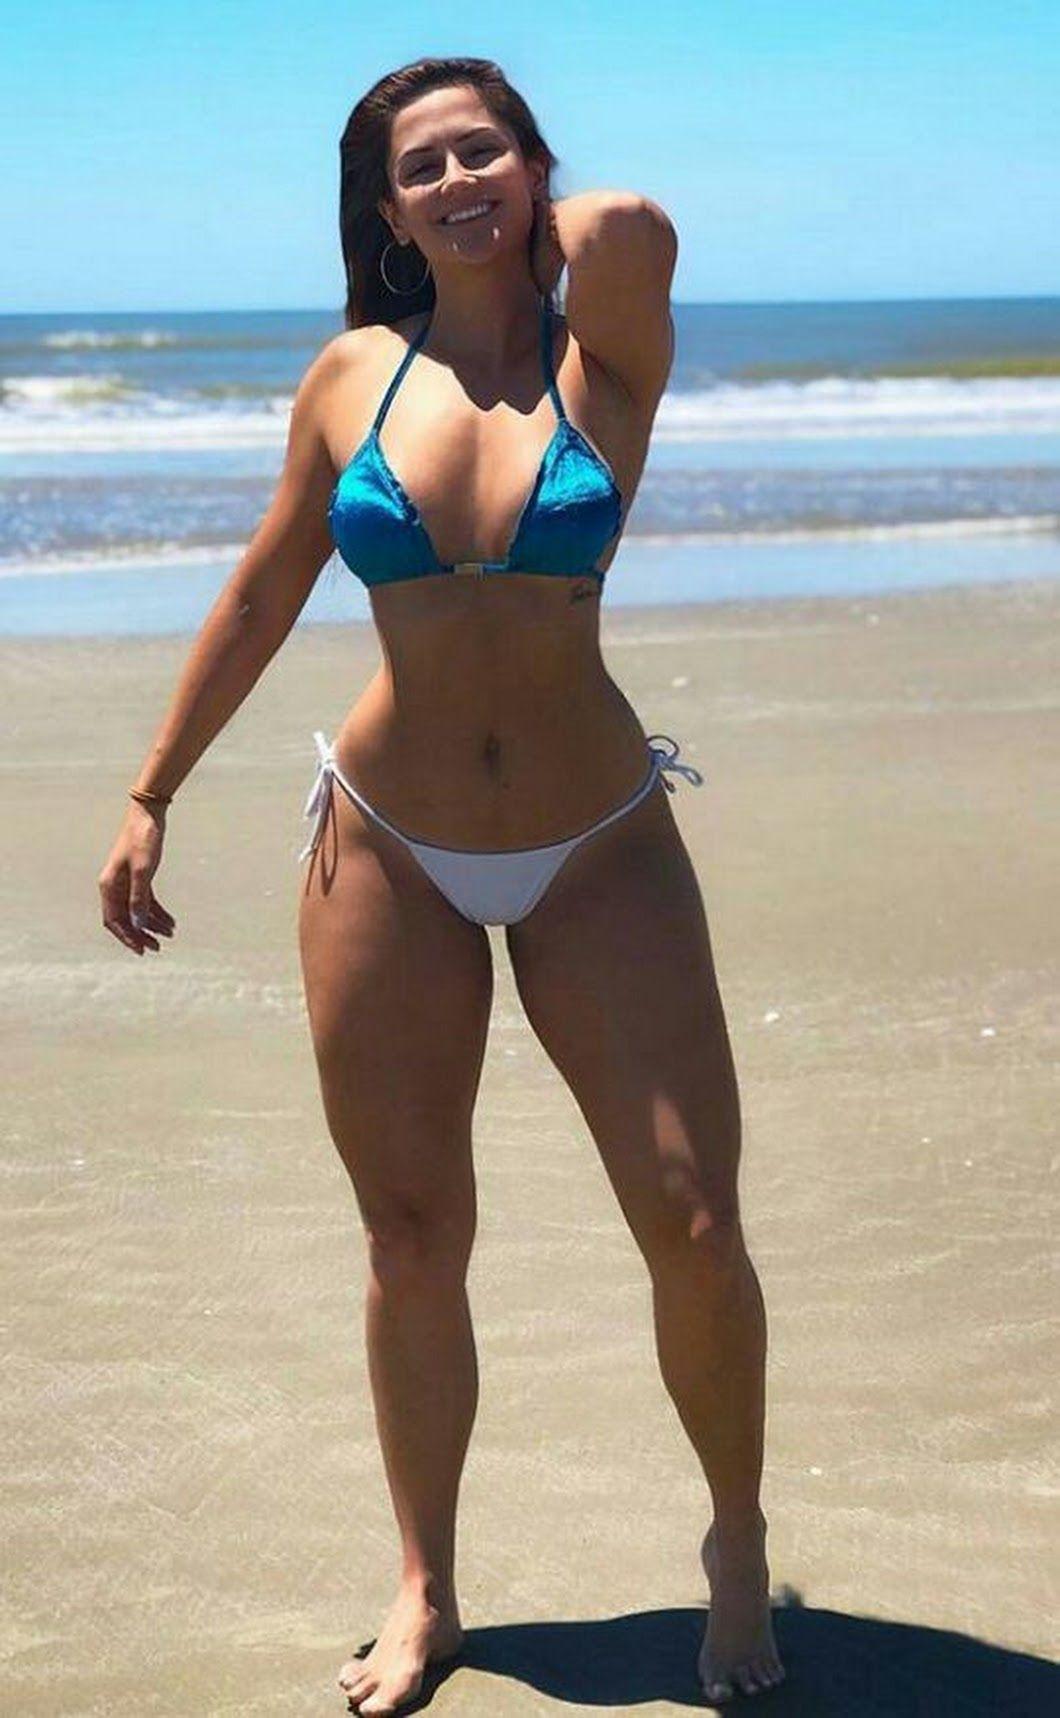 Infinitely Elrods bikini beach